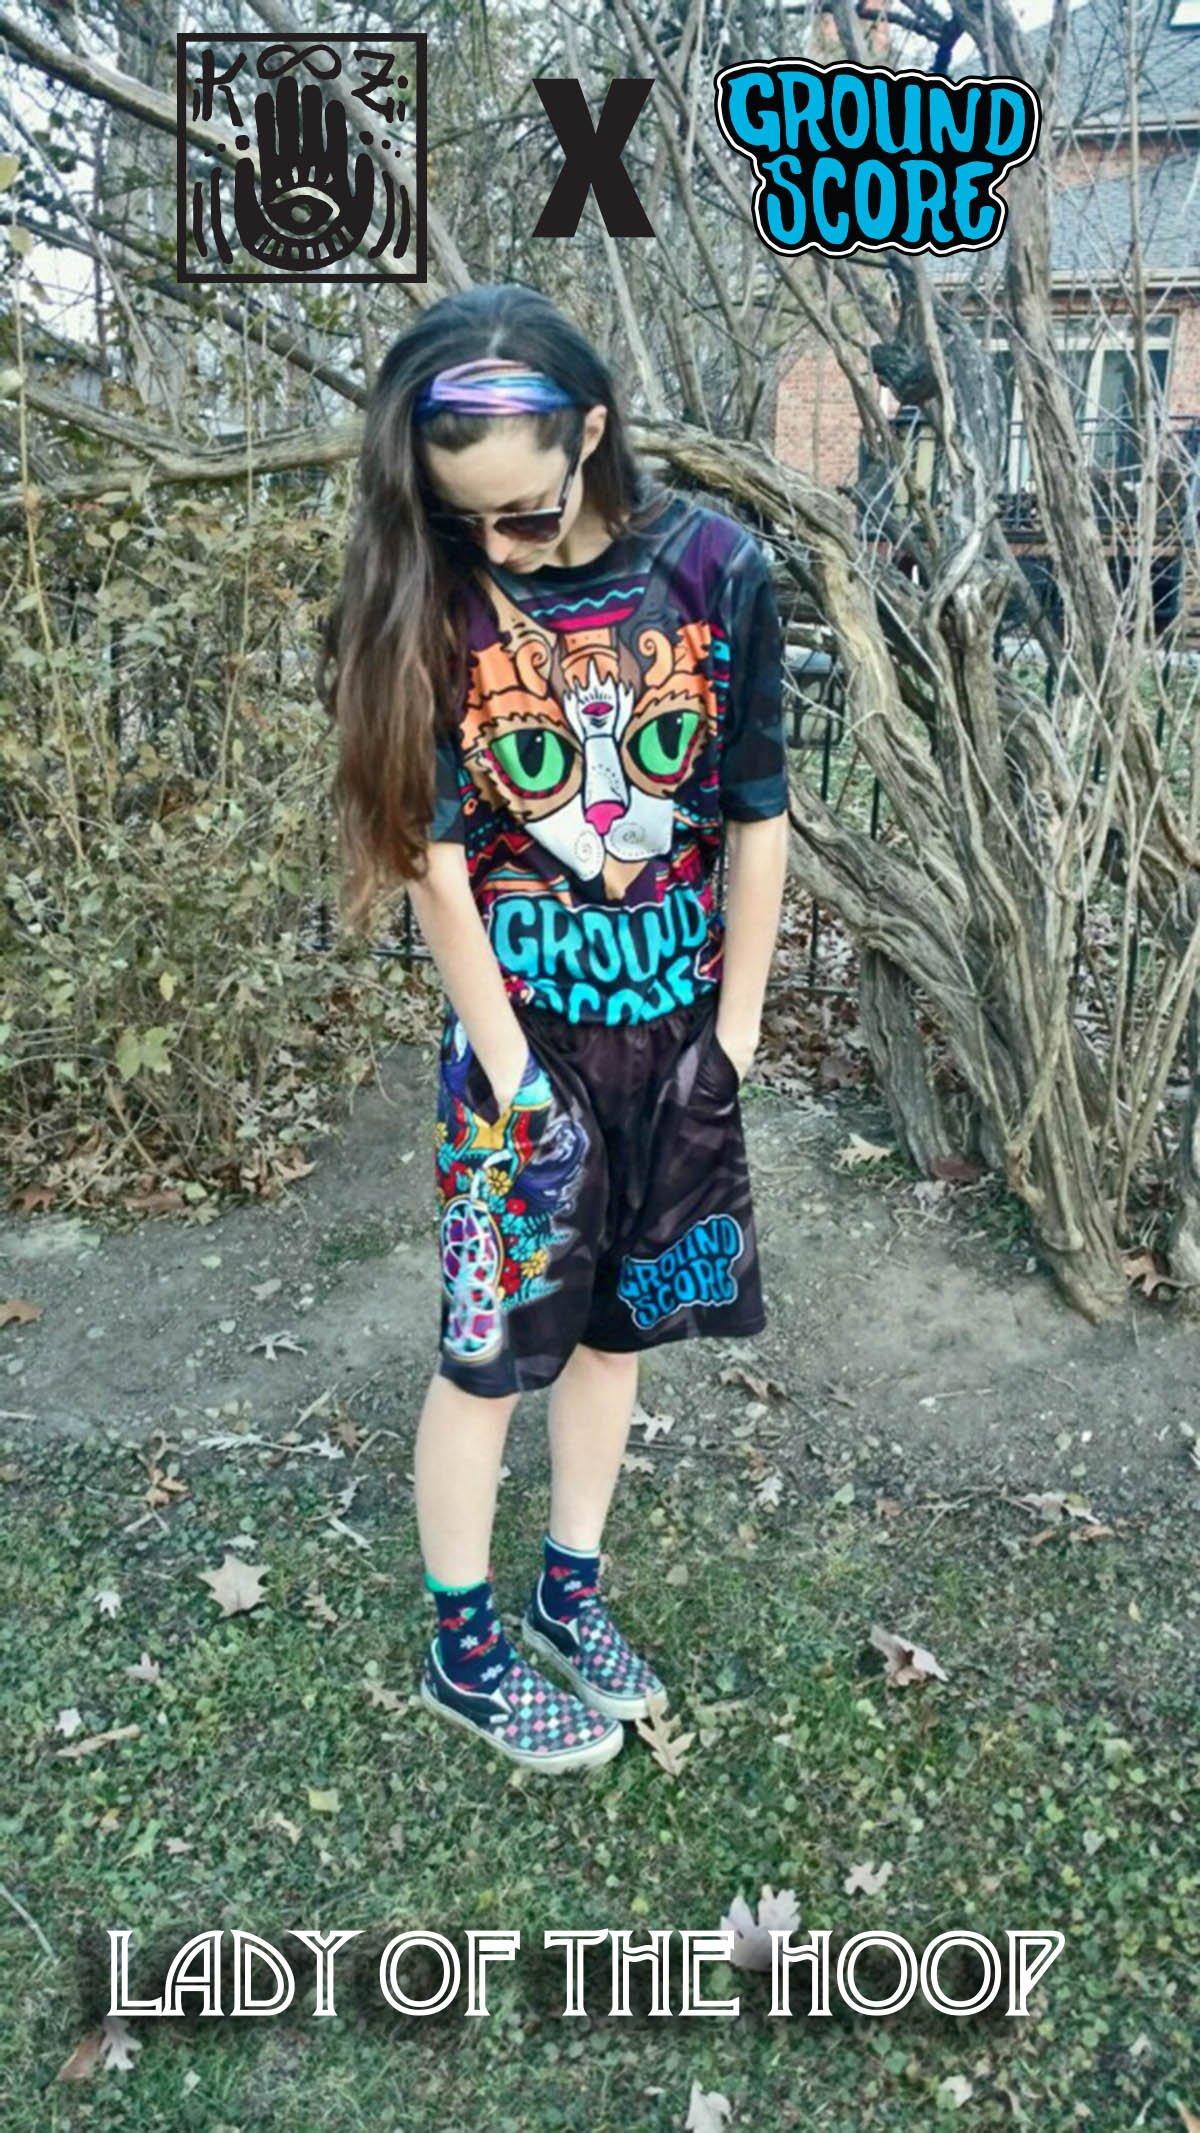 KOOZ - Lady of the Hoop Shorts (LE 25)